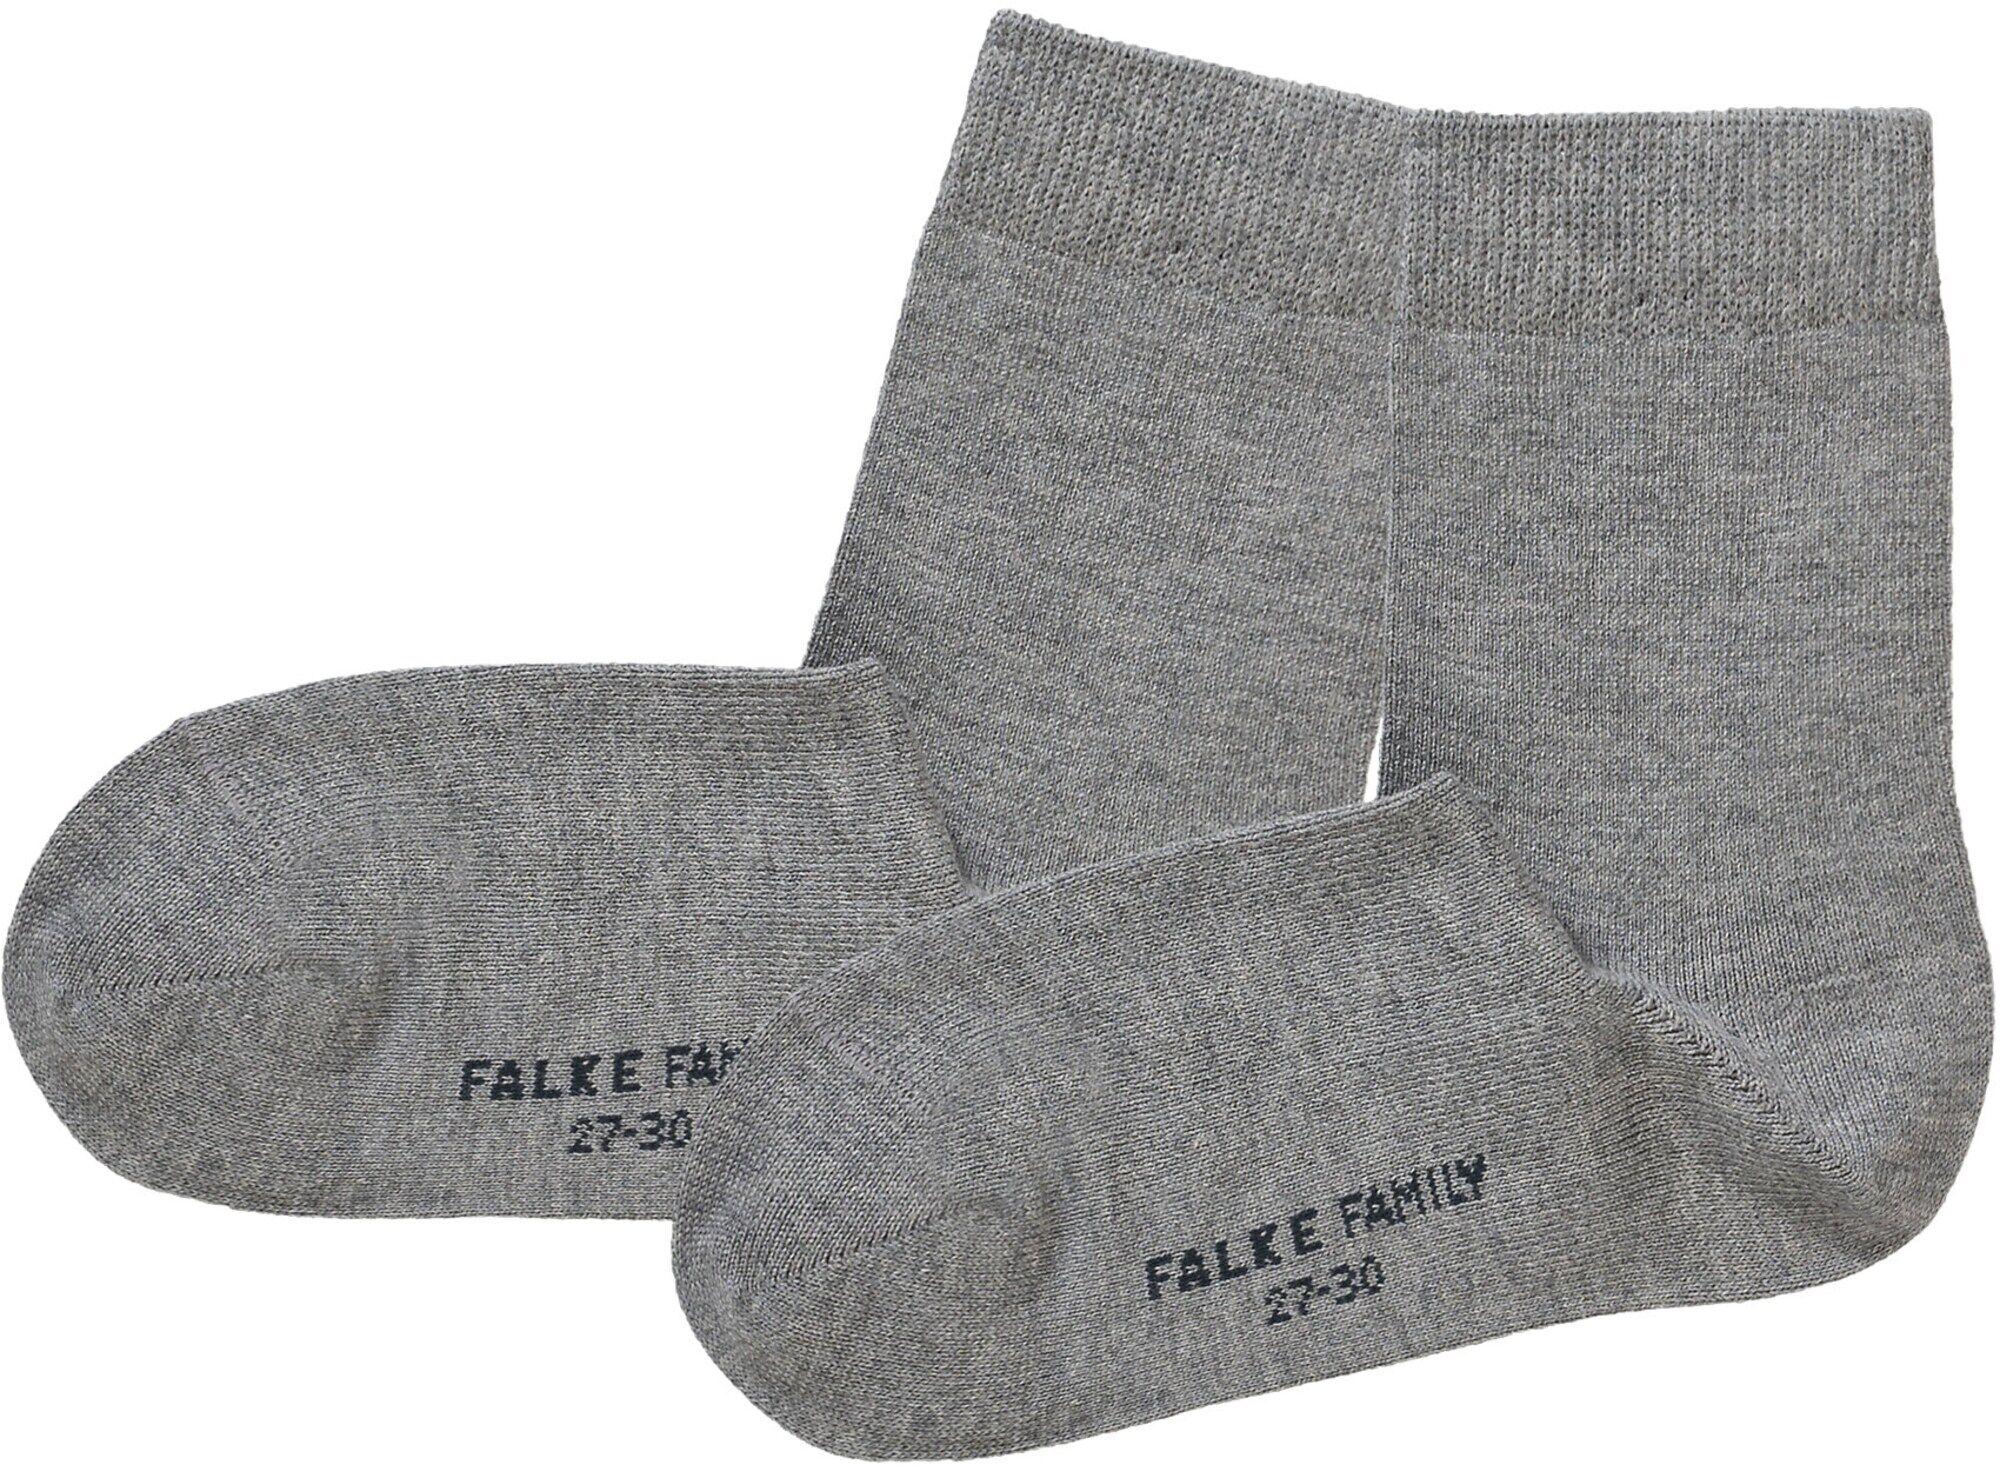 FALKE Chaussettes 'Family'  - Gris - Taille: 35-38 - boy